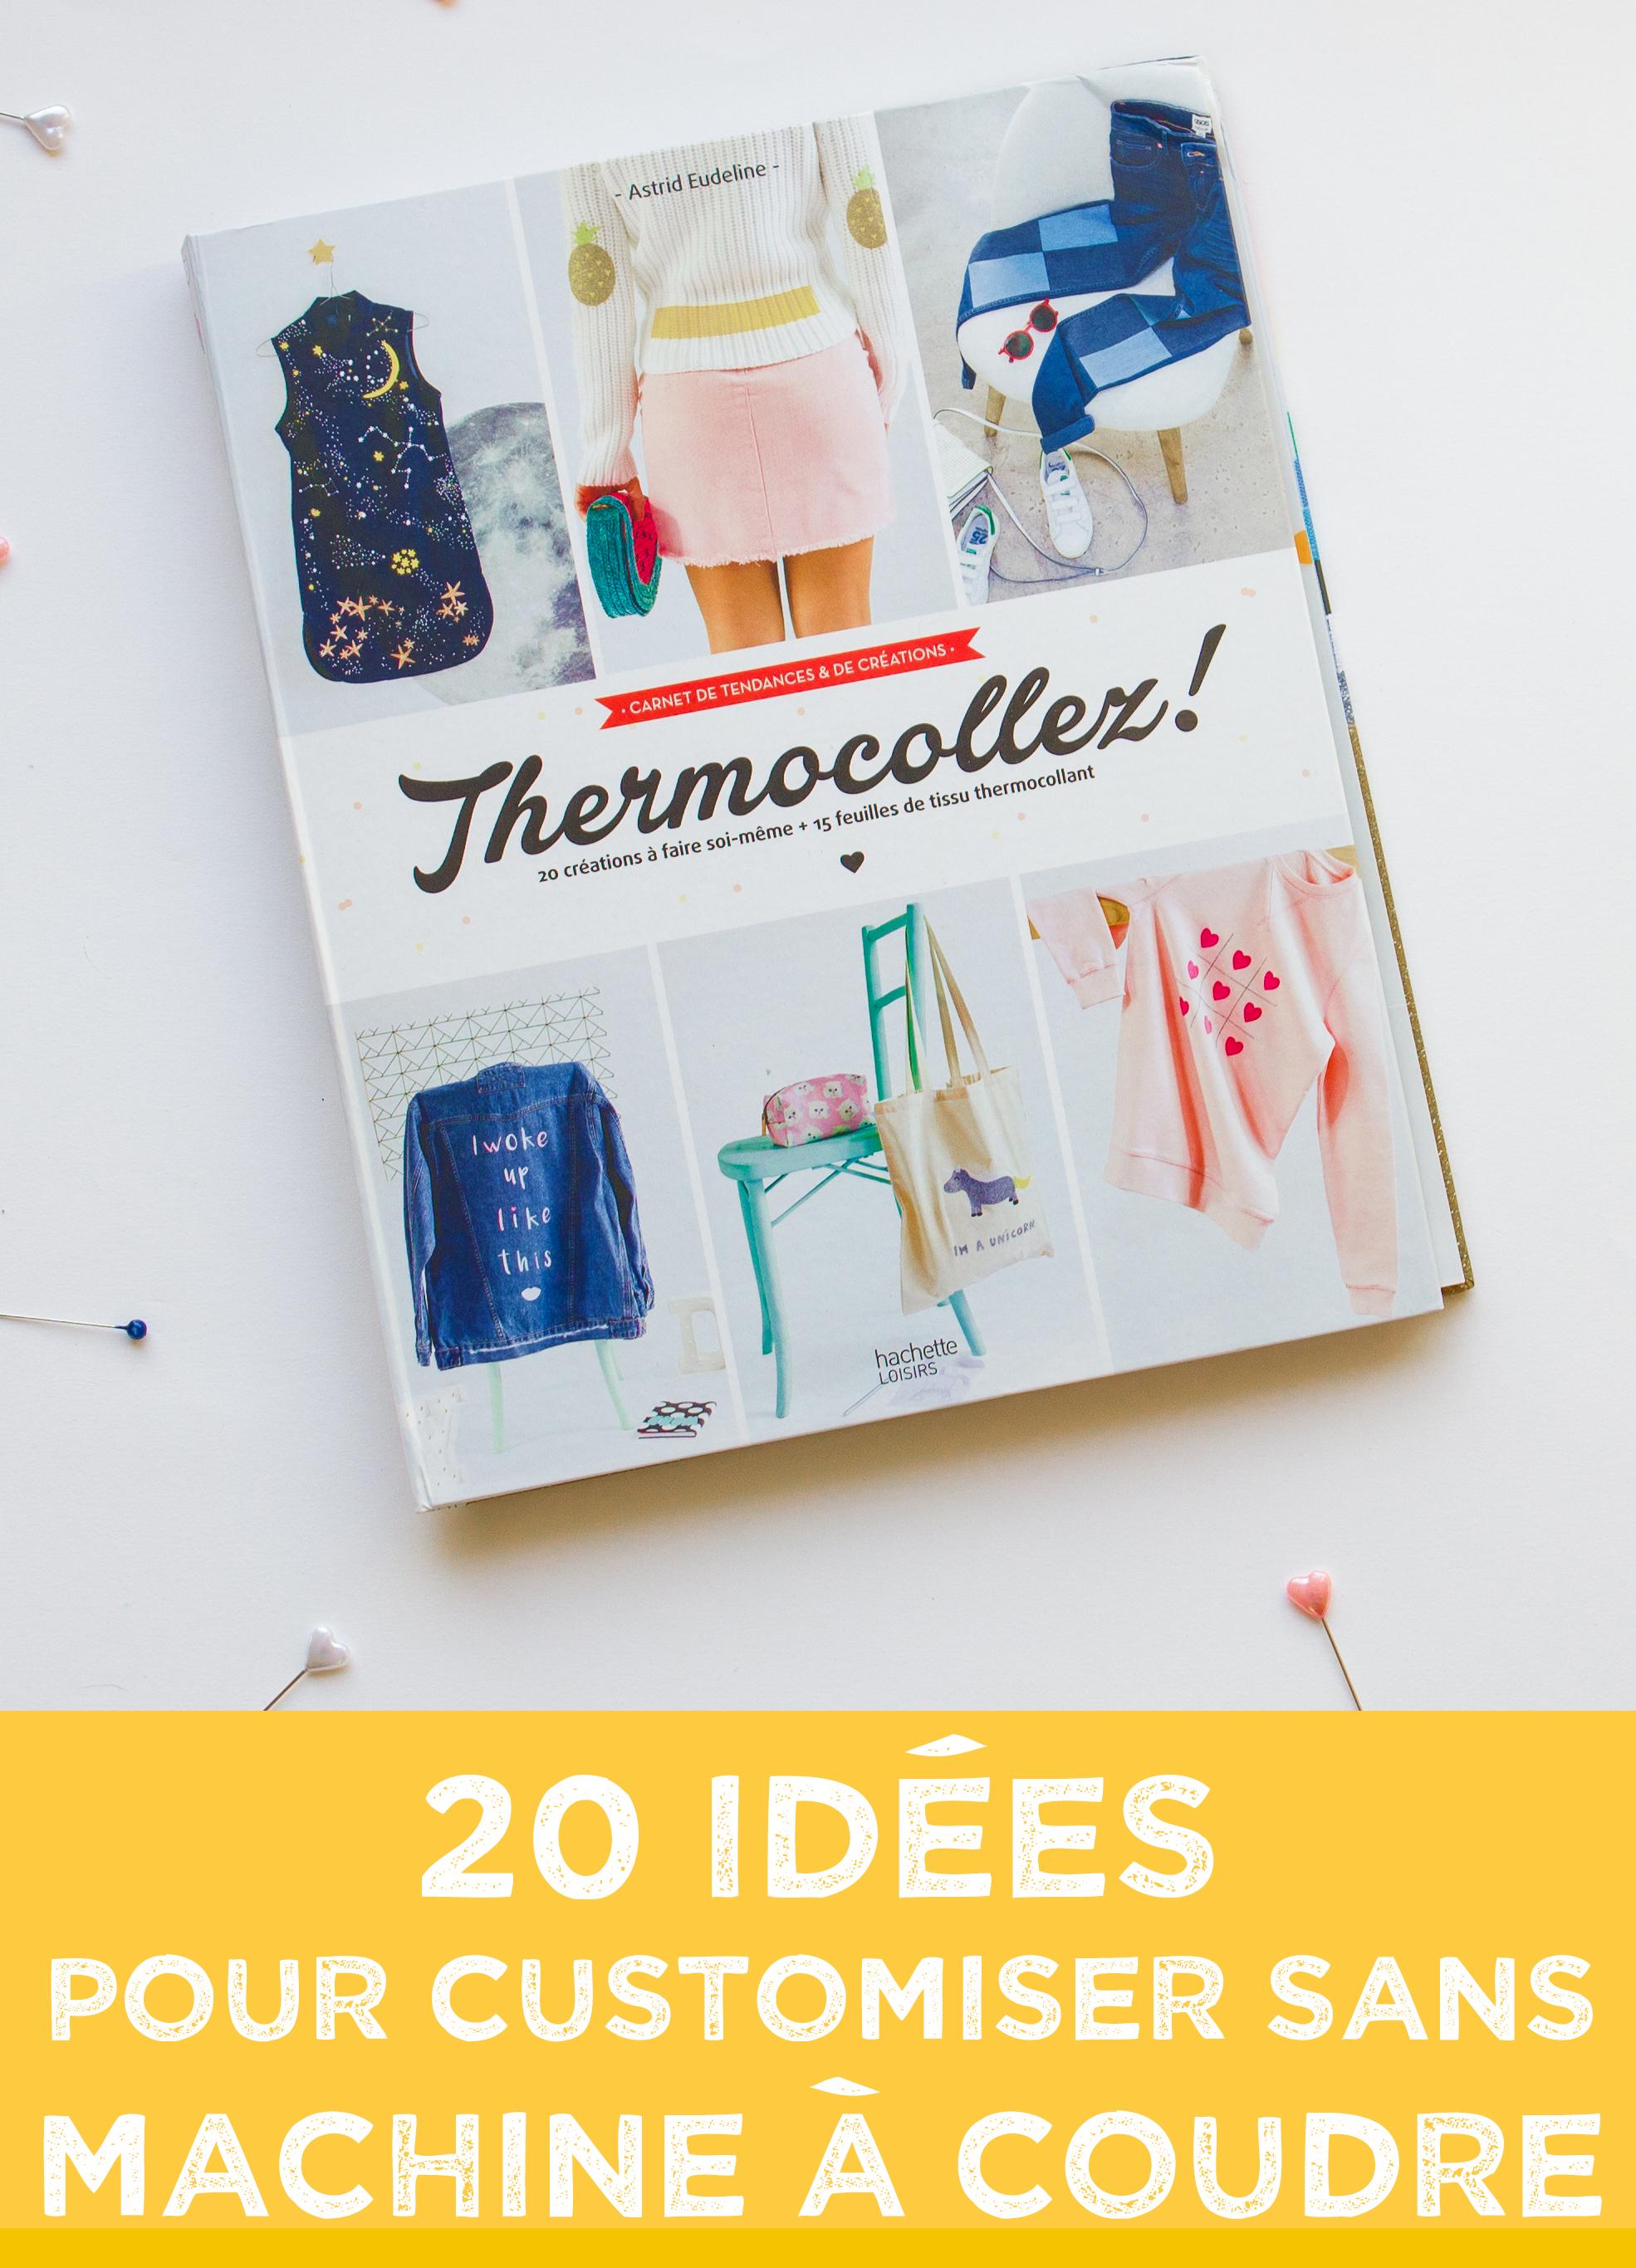 https://couturedebutant.fr/thermocollez-livre-apprendre-a-utiliser-thermocollant-decoratif/